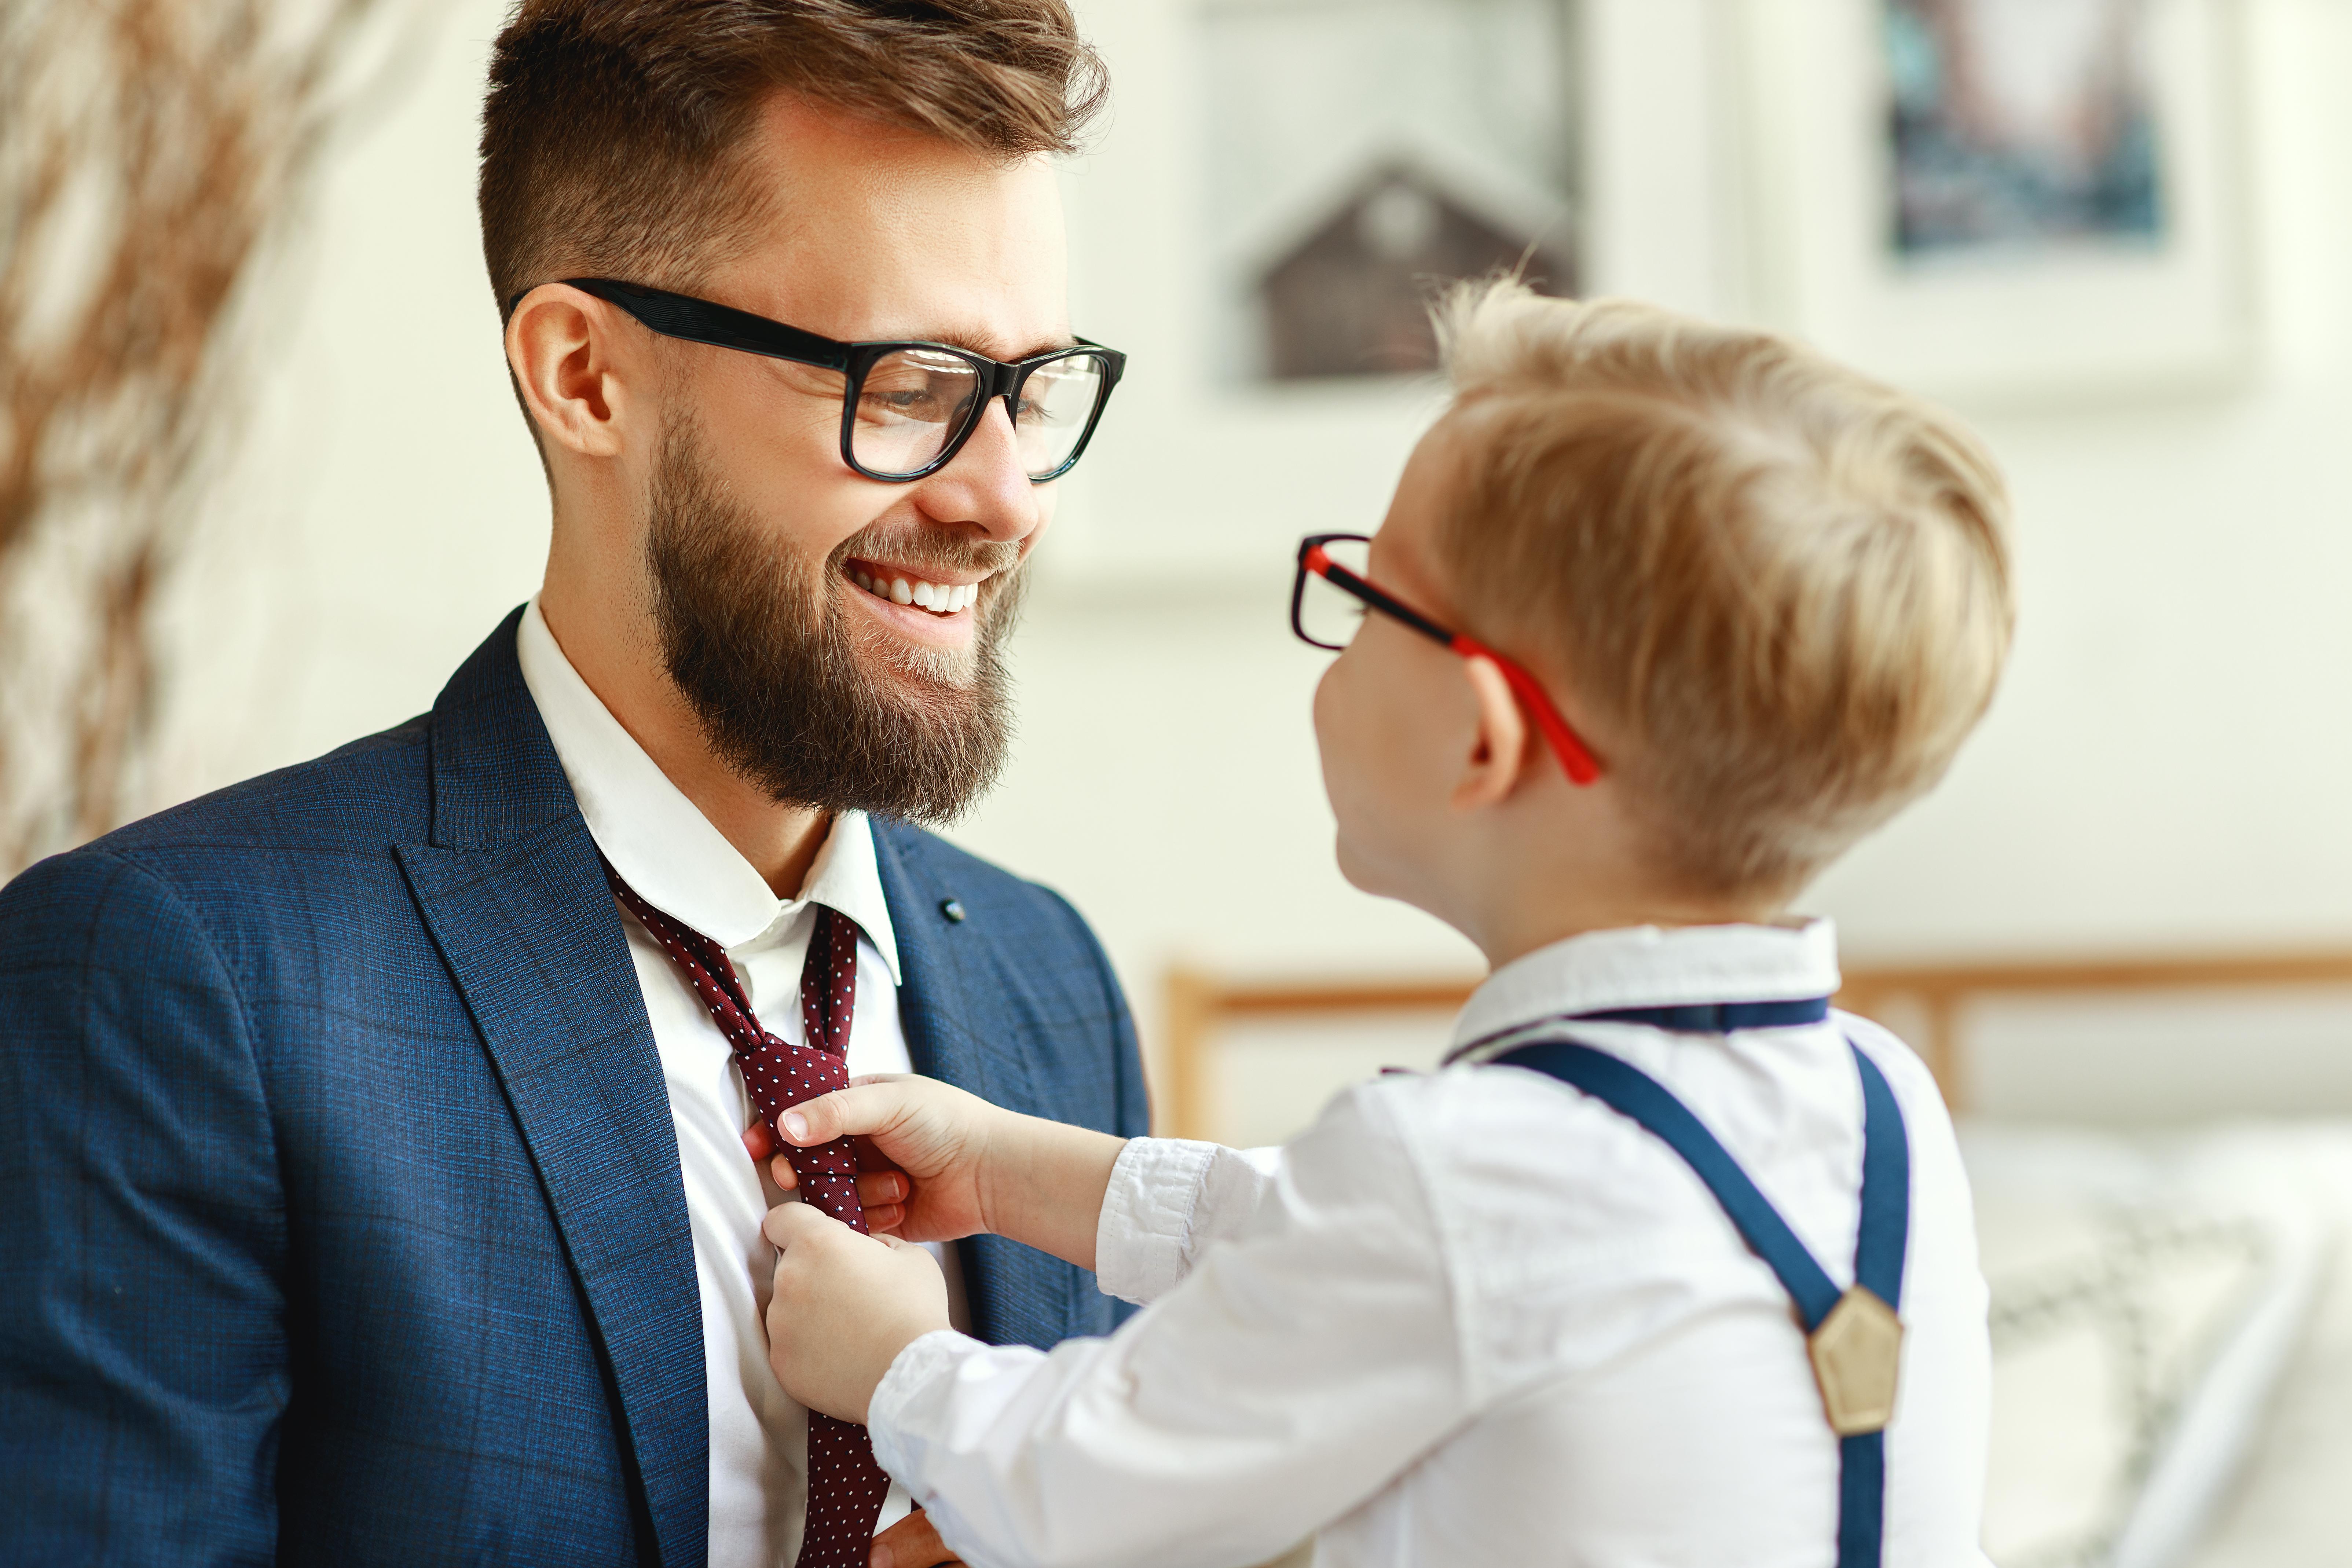 Entrepreneurship and Fatherhood